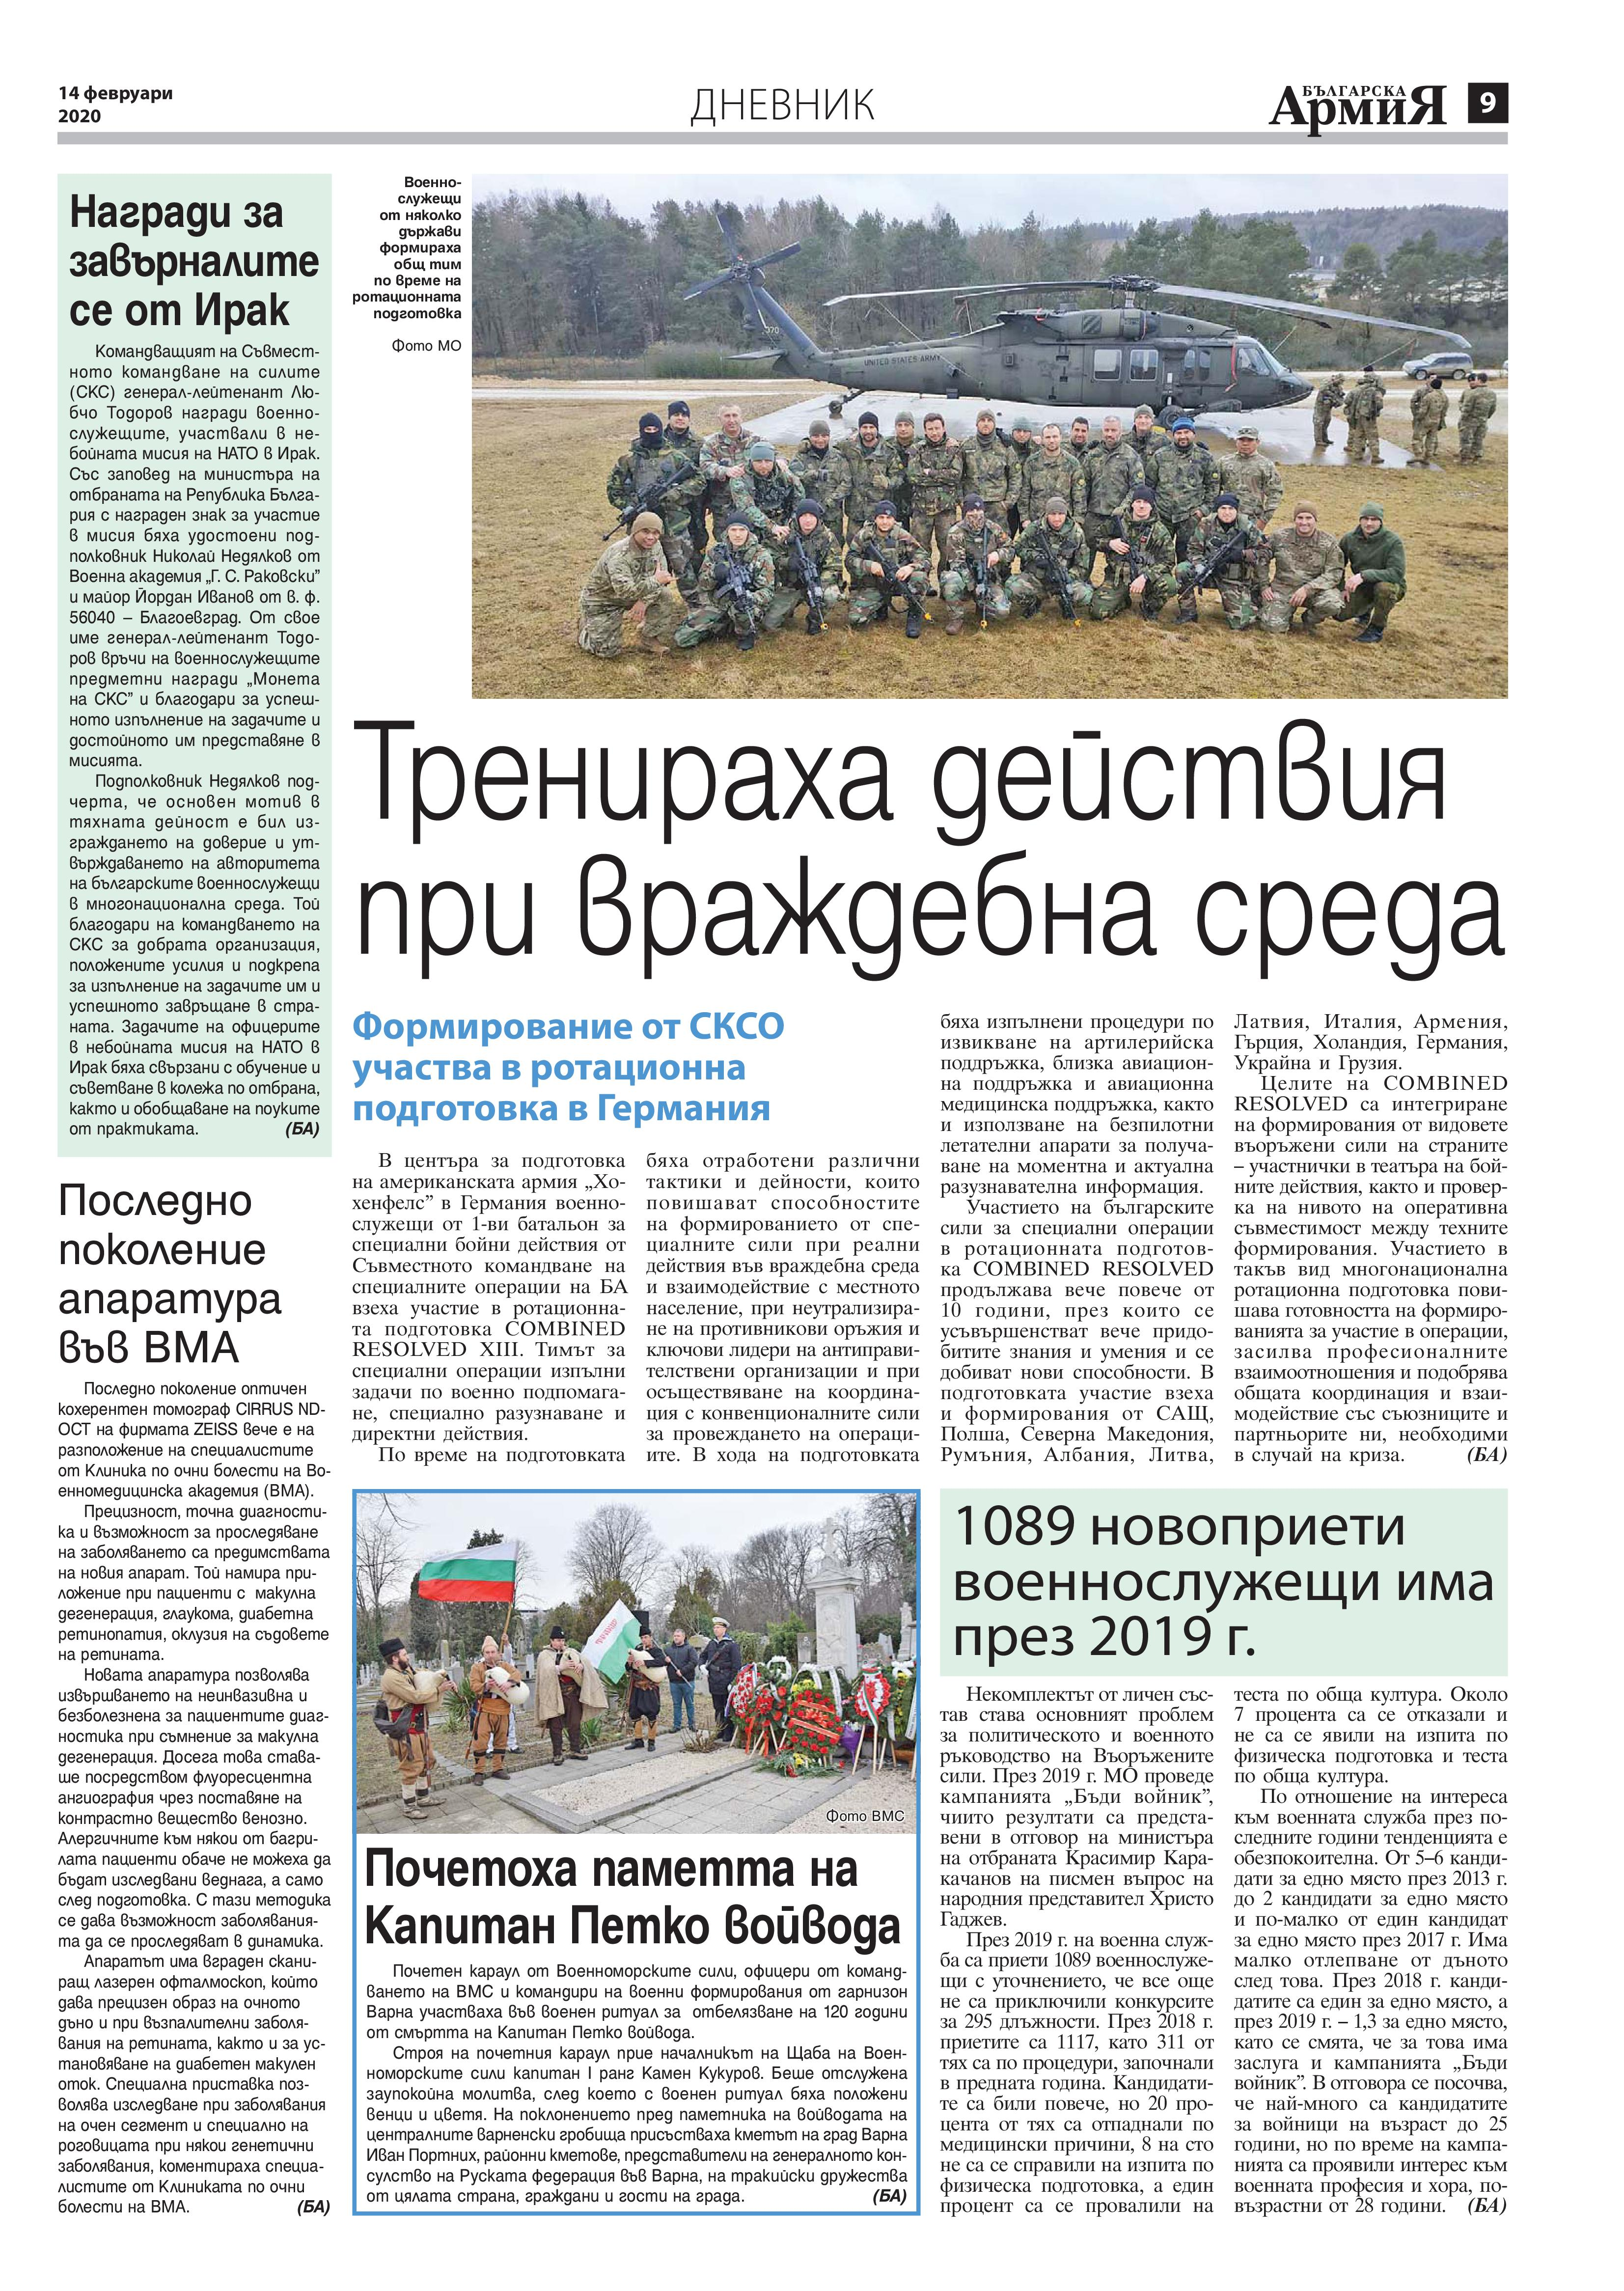 https://armymedia.bg/wp-content/uploads/2015/06/09-34.jpg